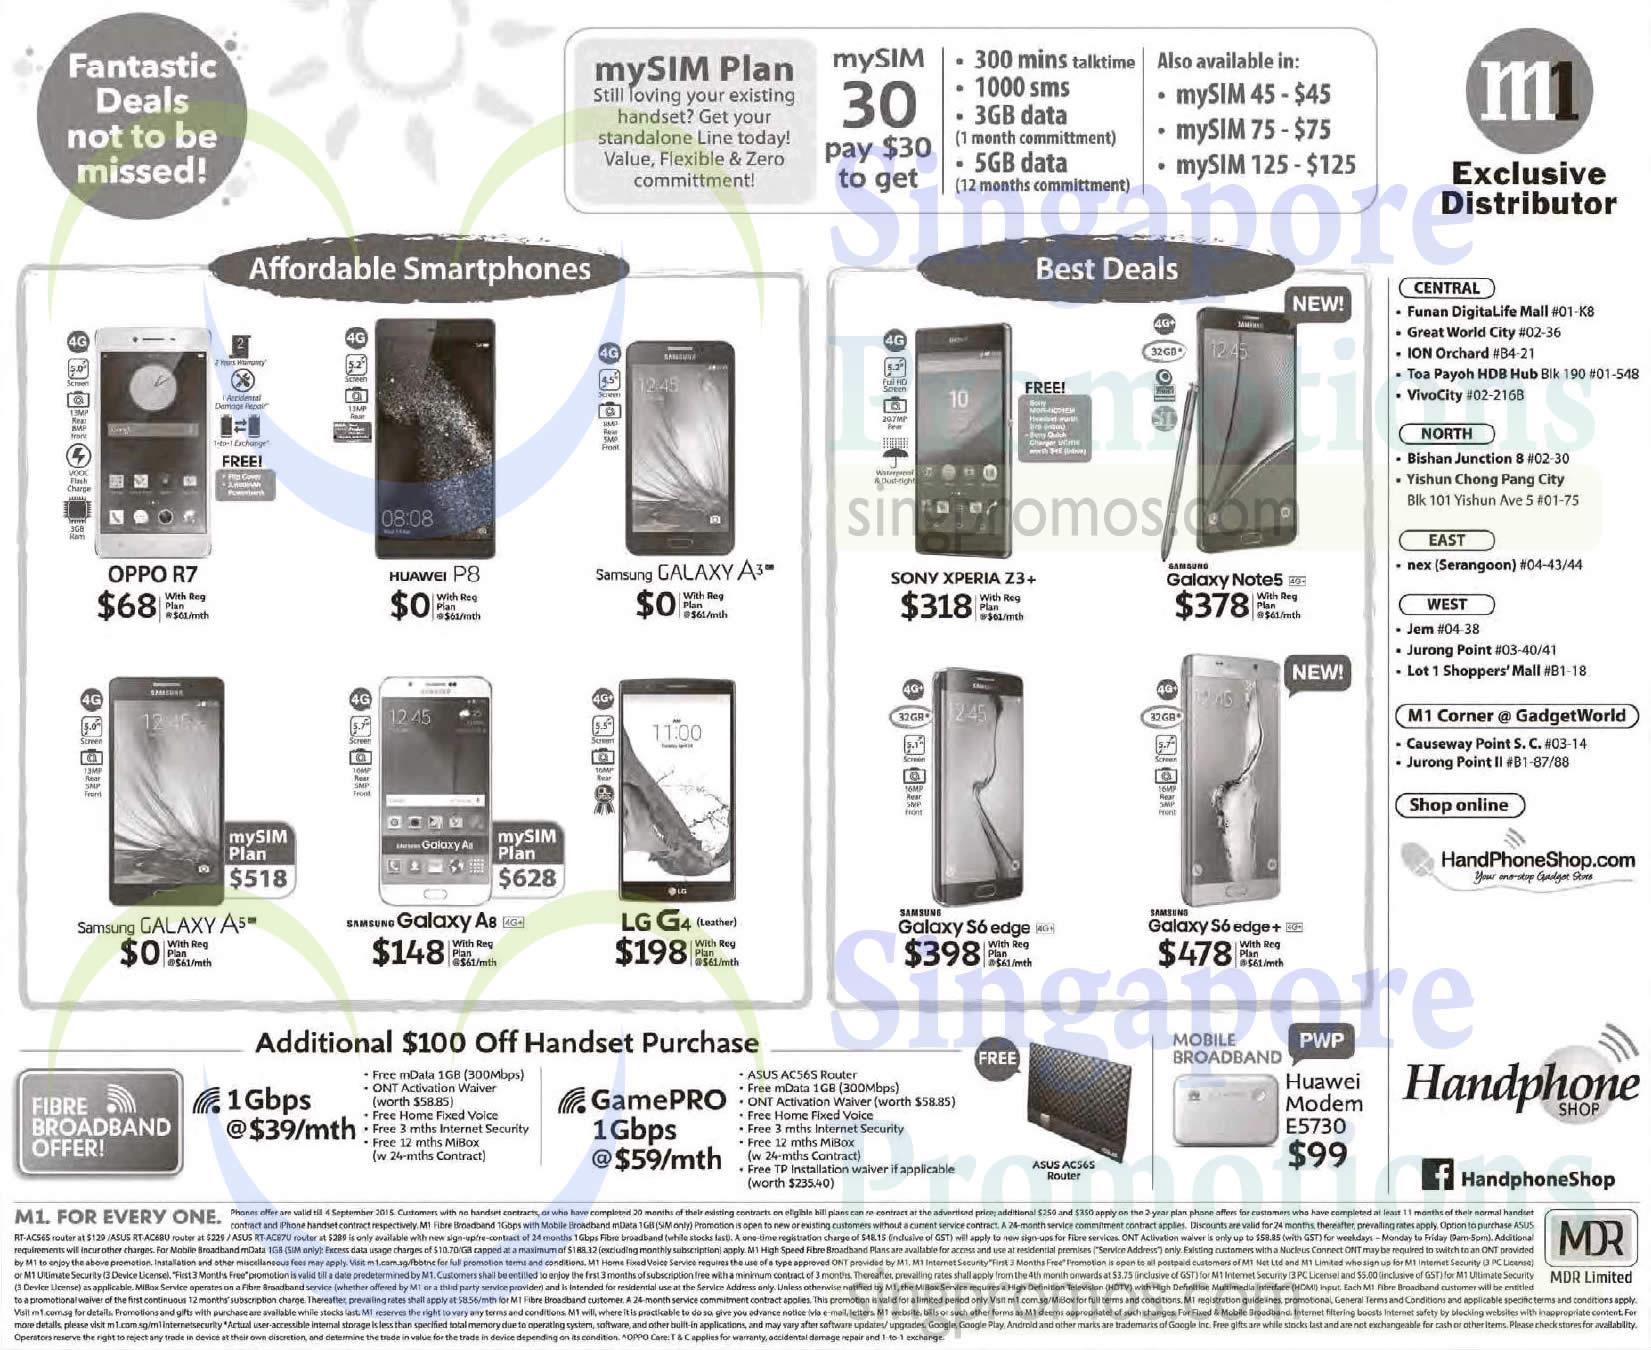 Handphone Shop Oppo R7 Huawei P8 LG G4 Samsung Galaxy